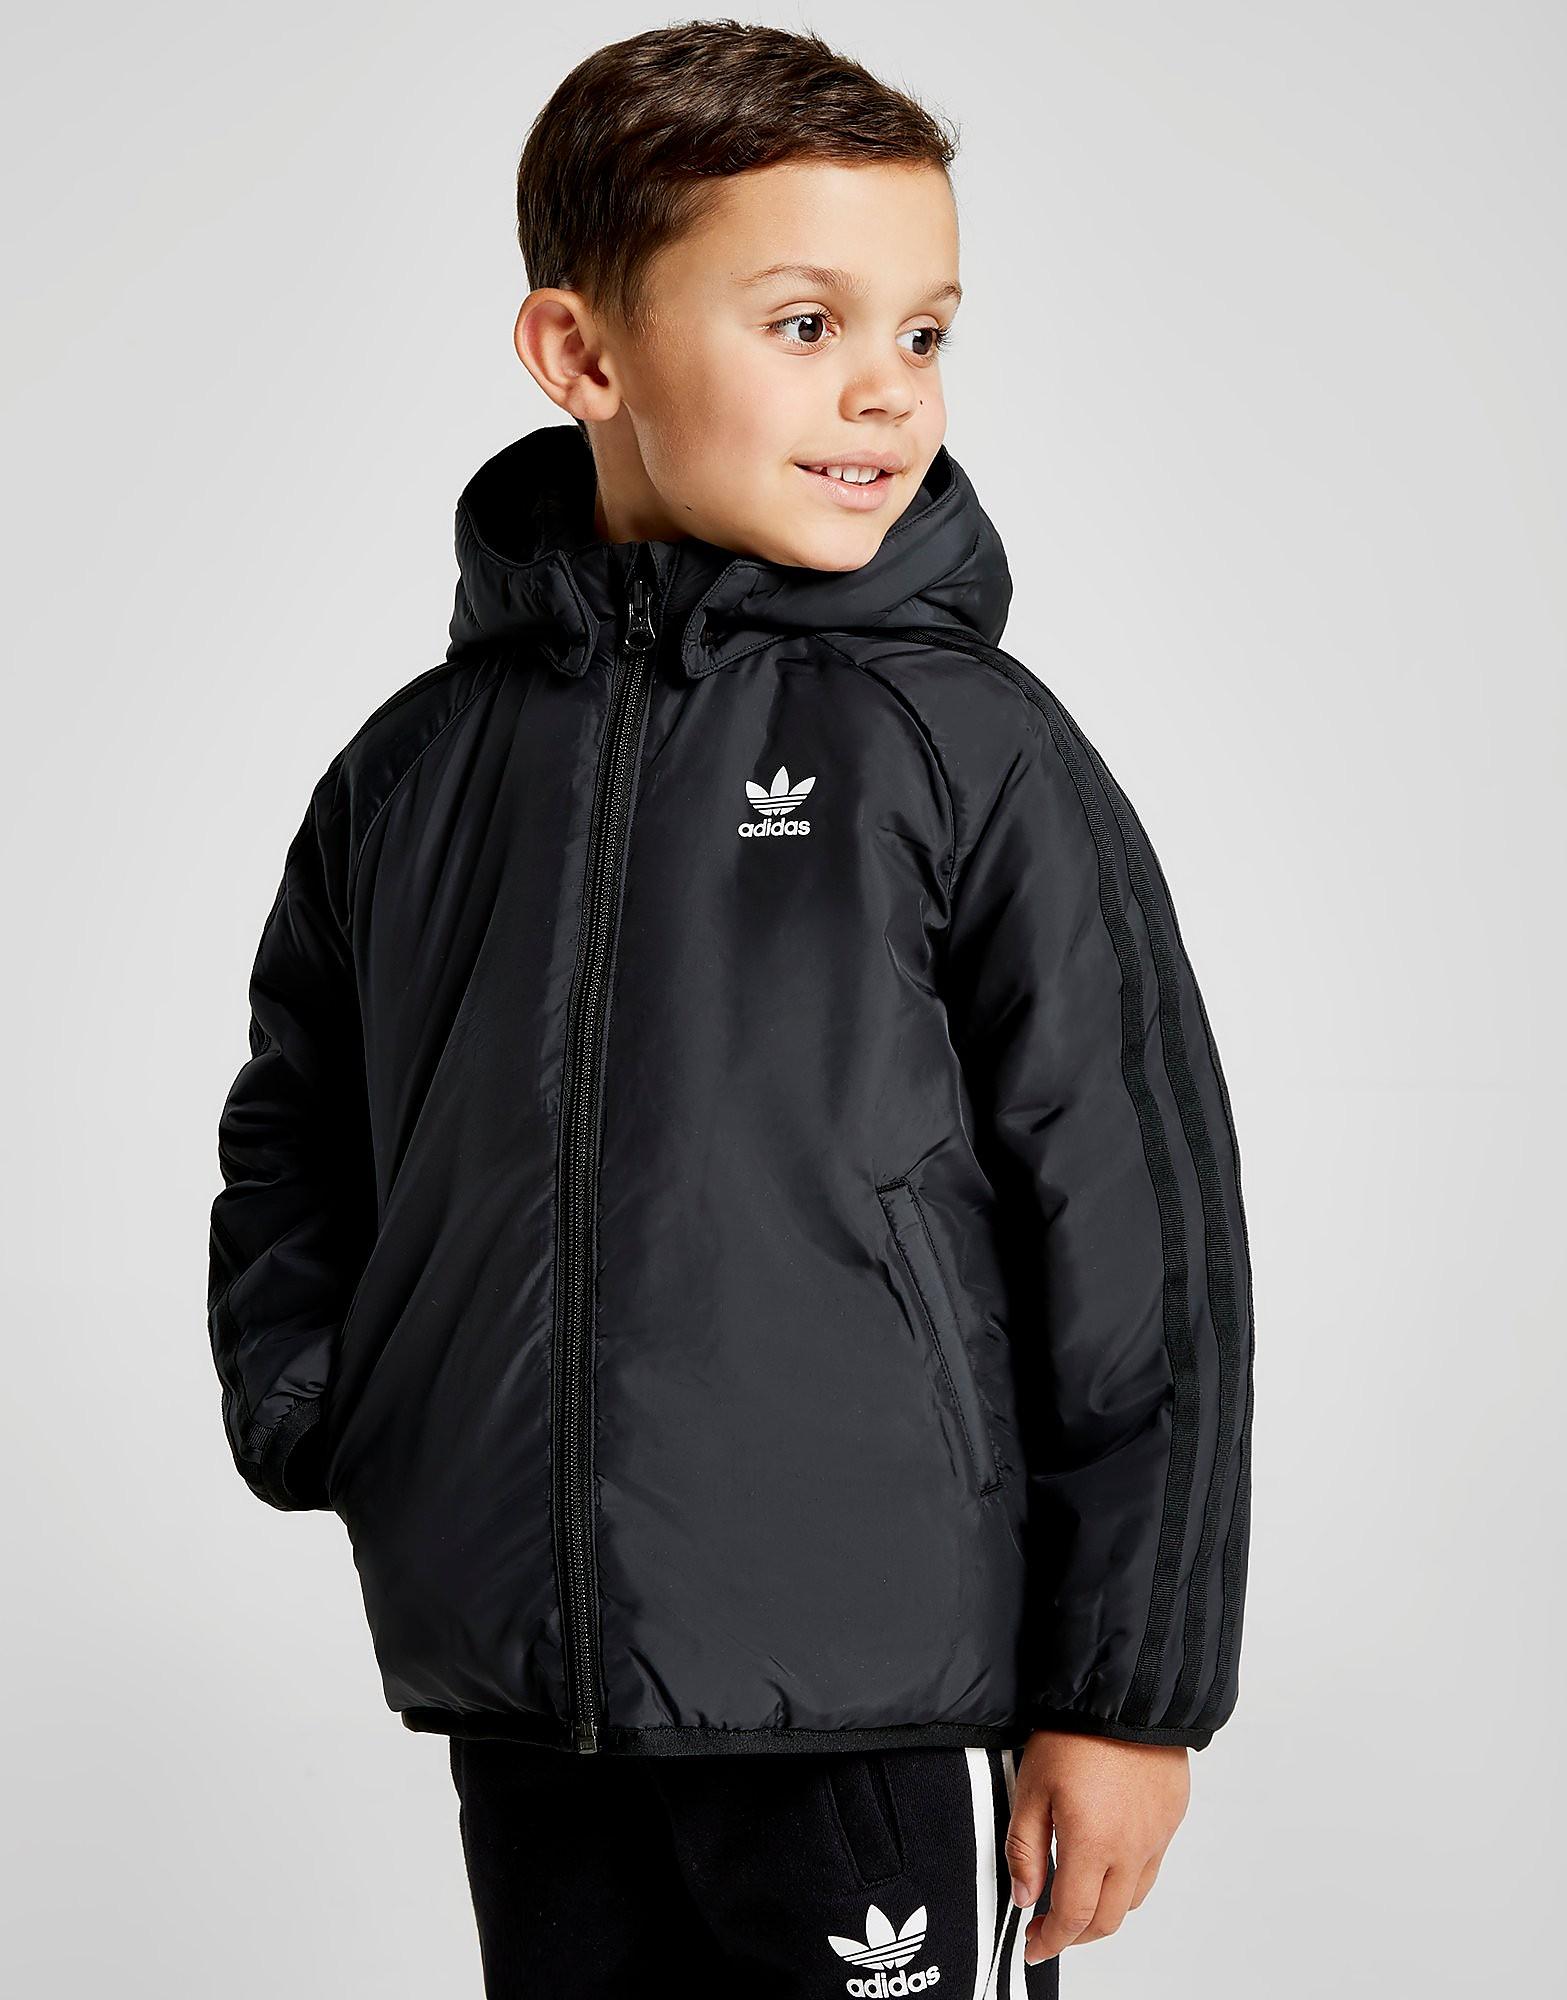 adidas Originals Padded Jacket Kinderen - Zwart - Kind